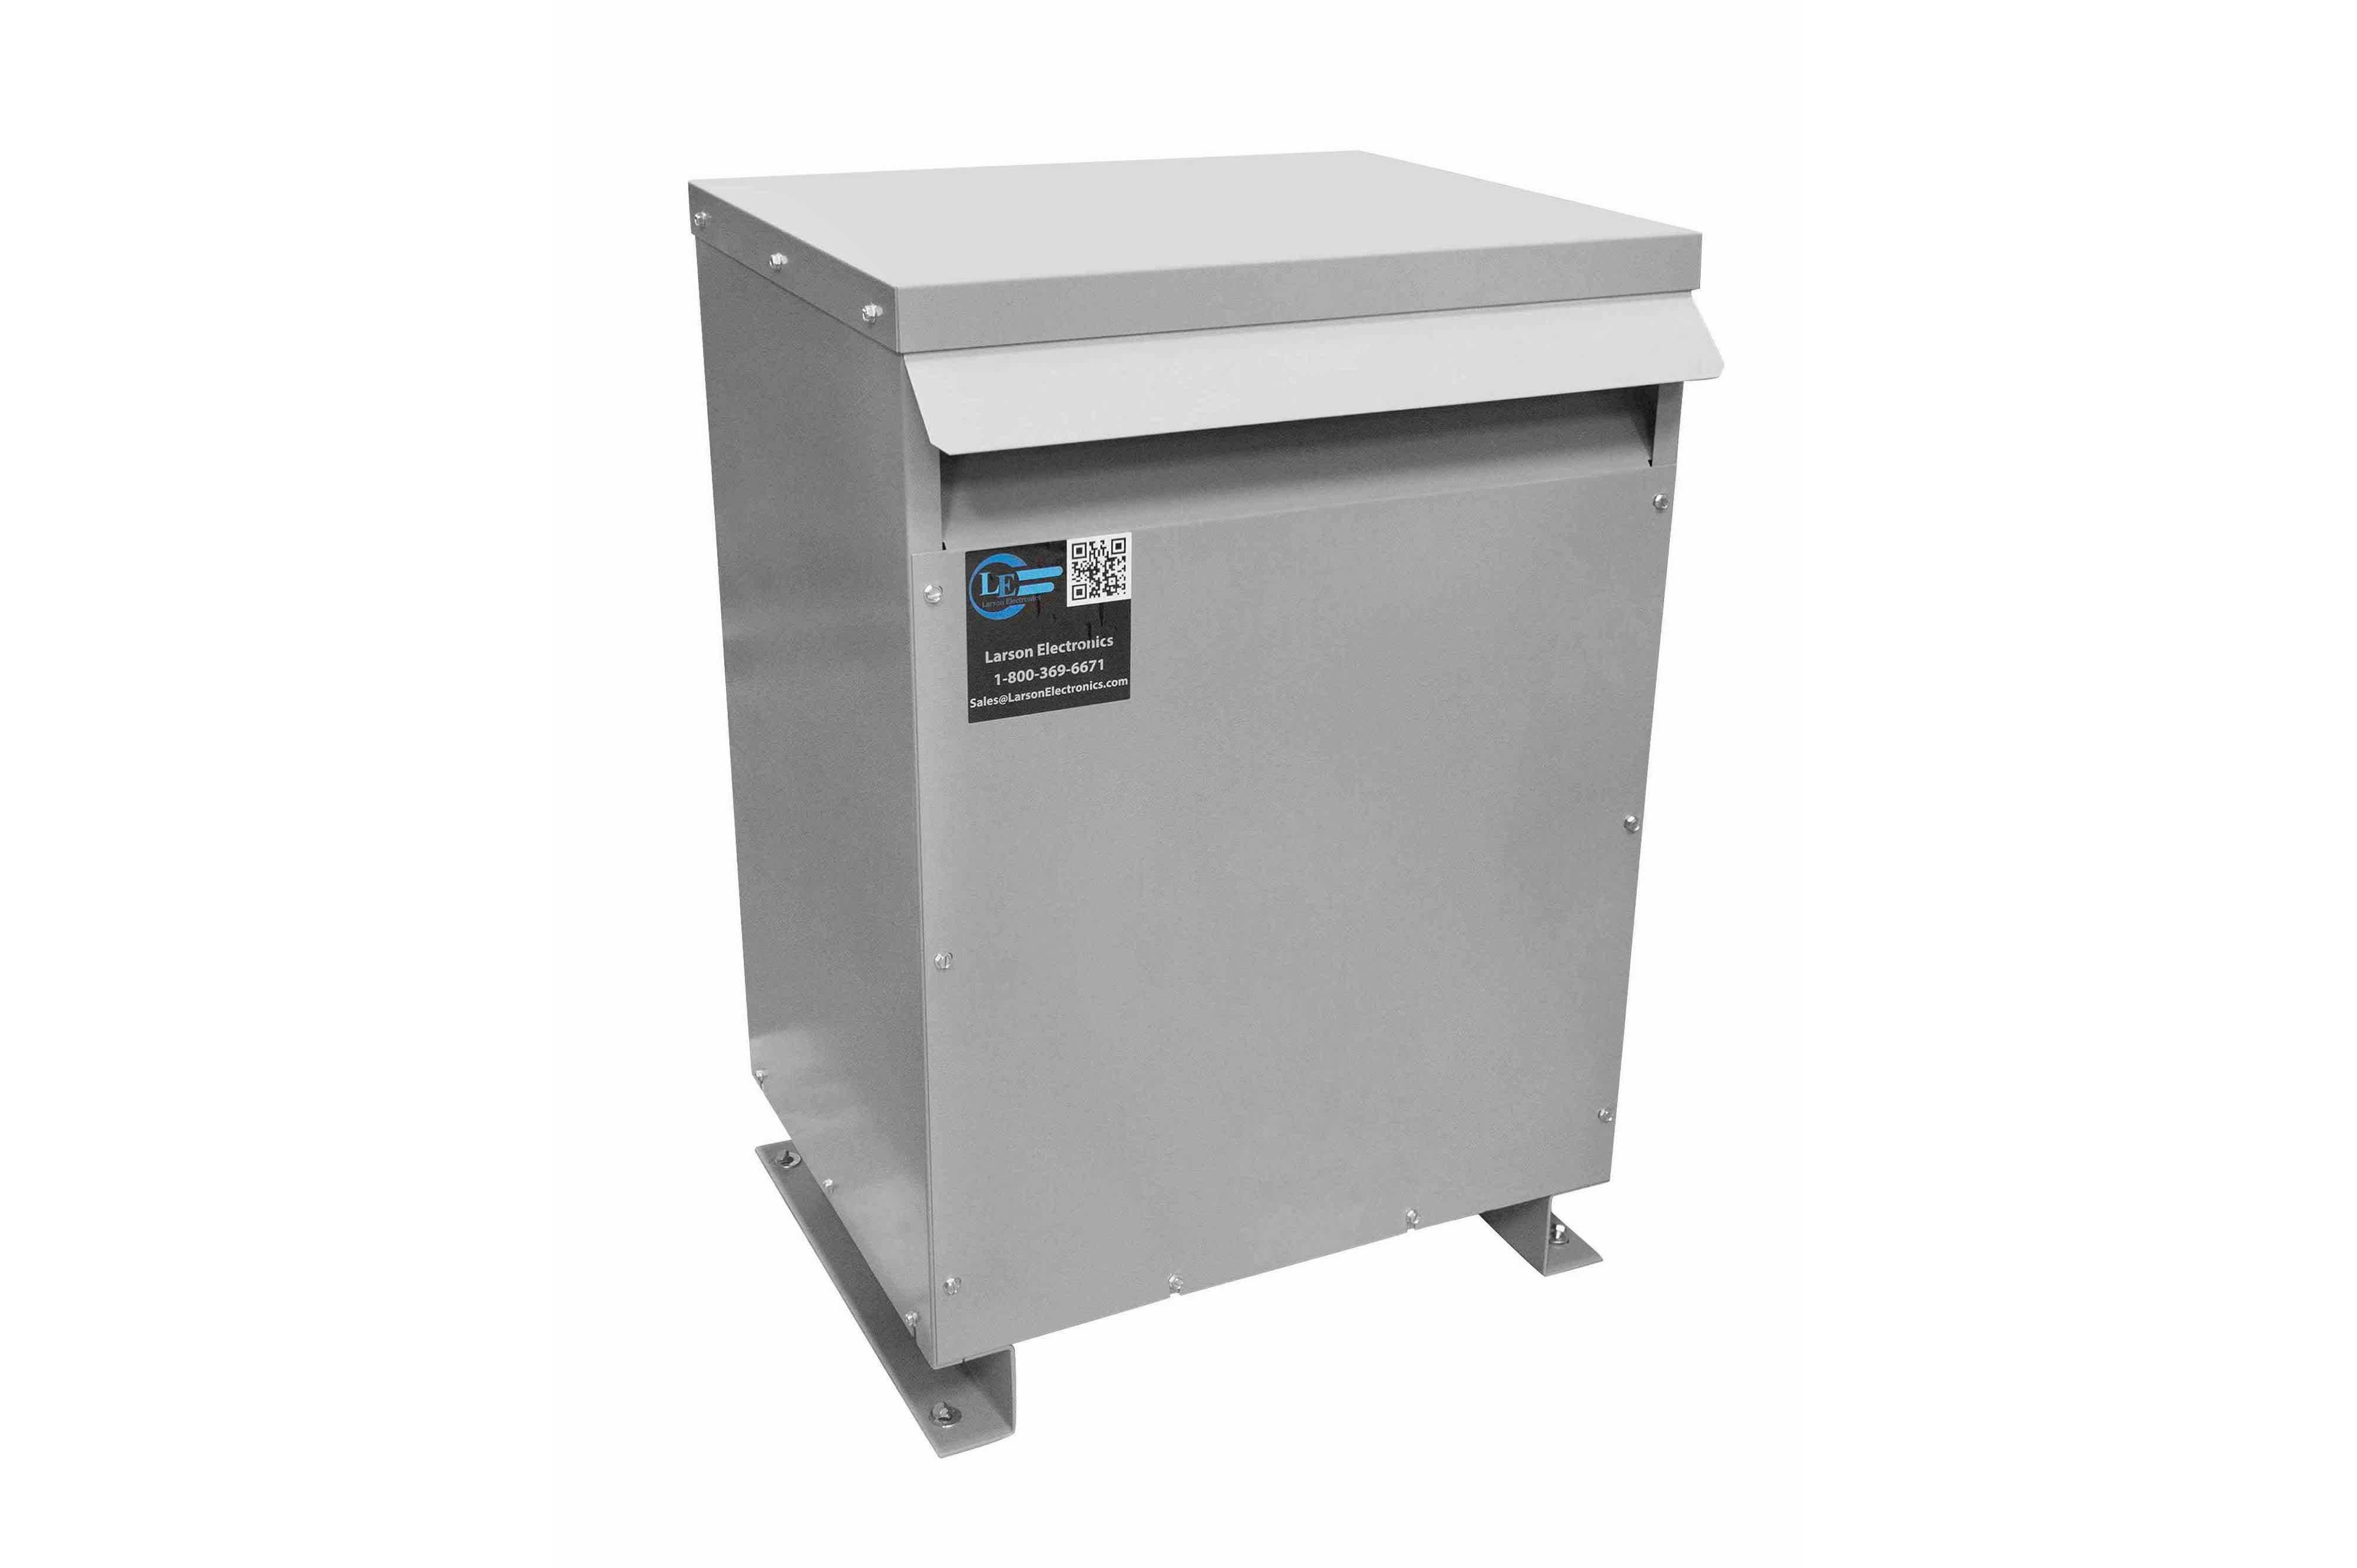 36 kVA 3PH Isolation Transformer, 240V Wye Primary, 600V Delta Secondary, N3R, Ventilated, 60 Hz